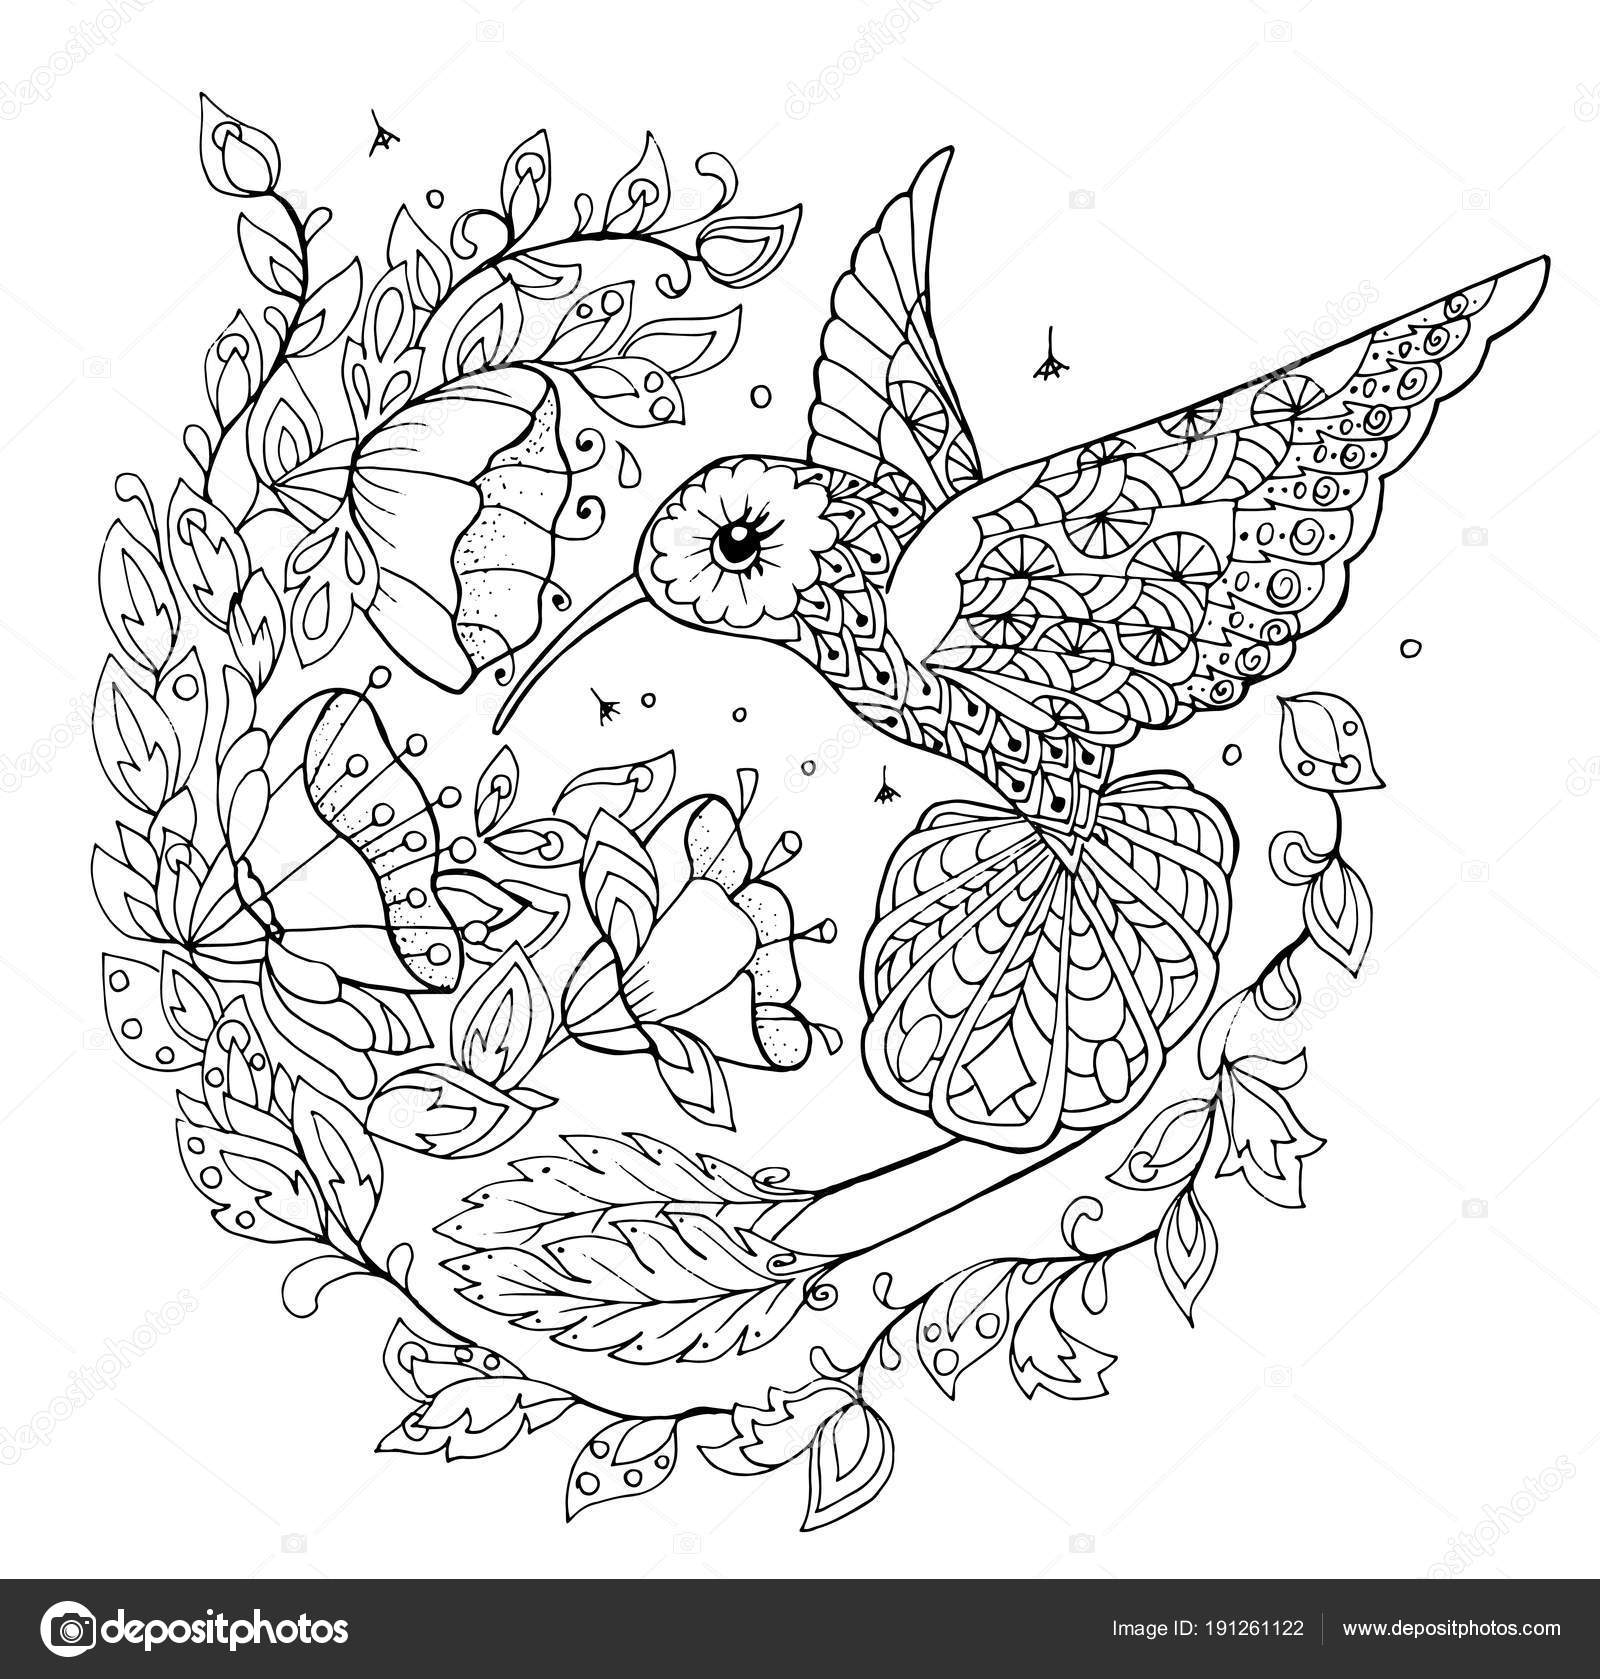 Hummingbird Coloring Book Hummingbird Coloring Book Stock